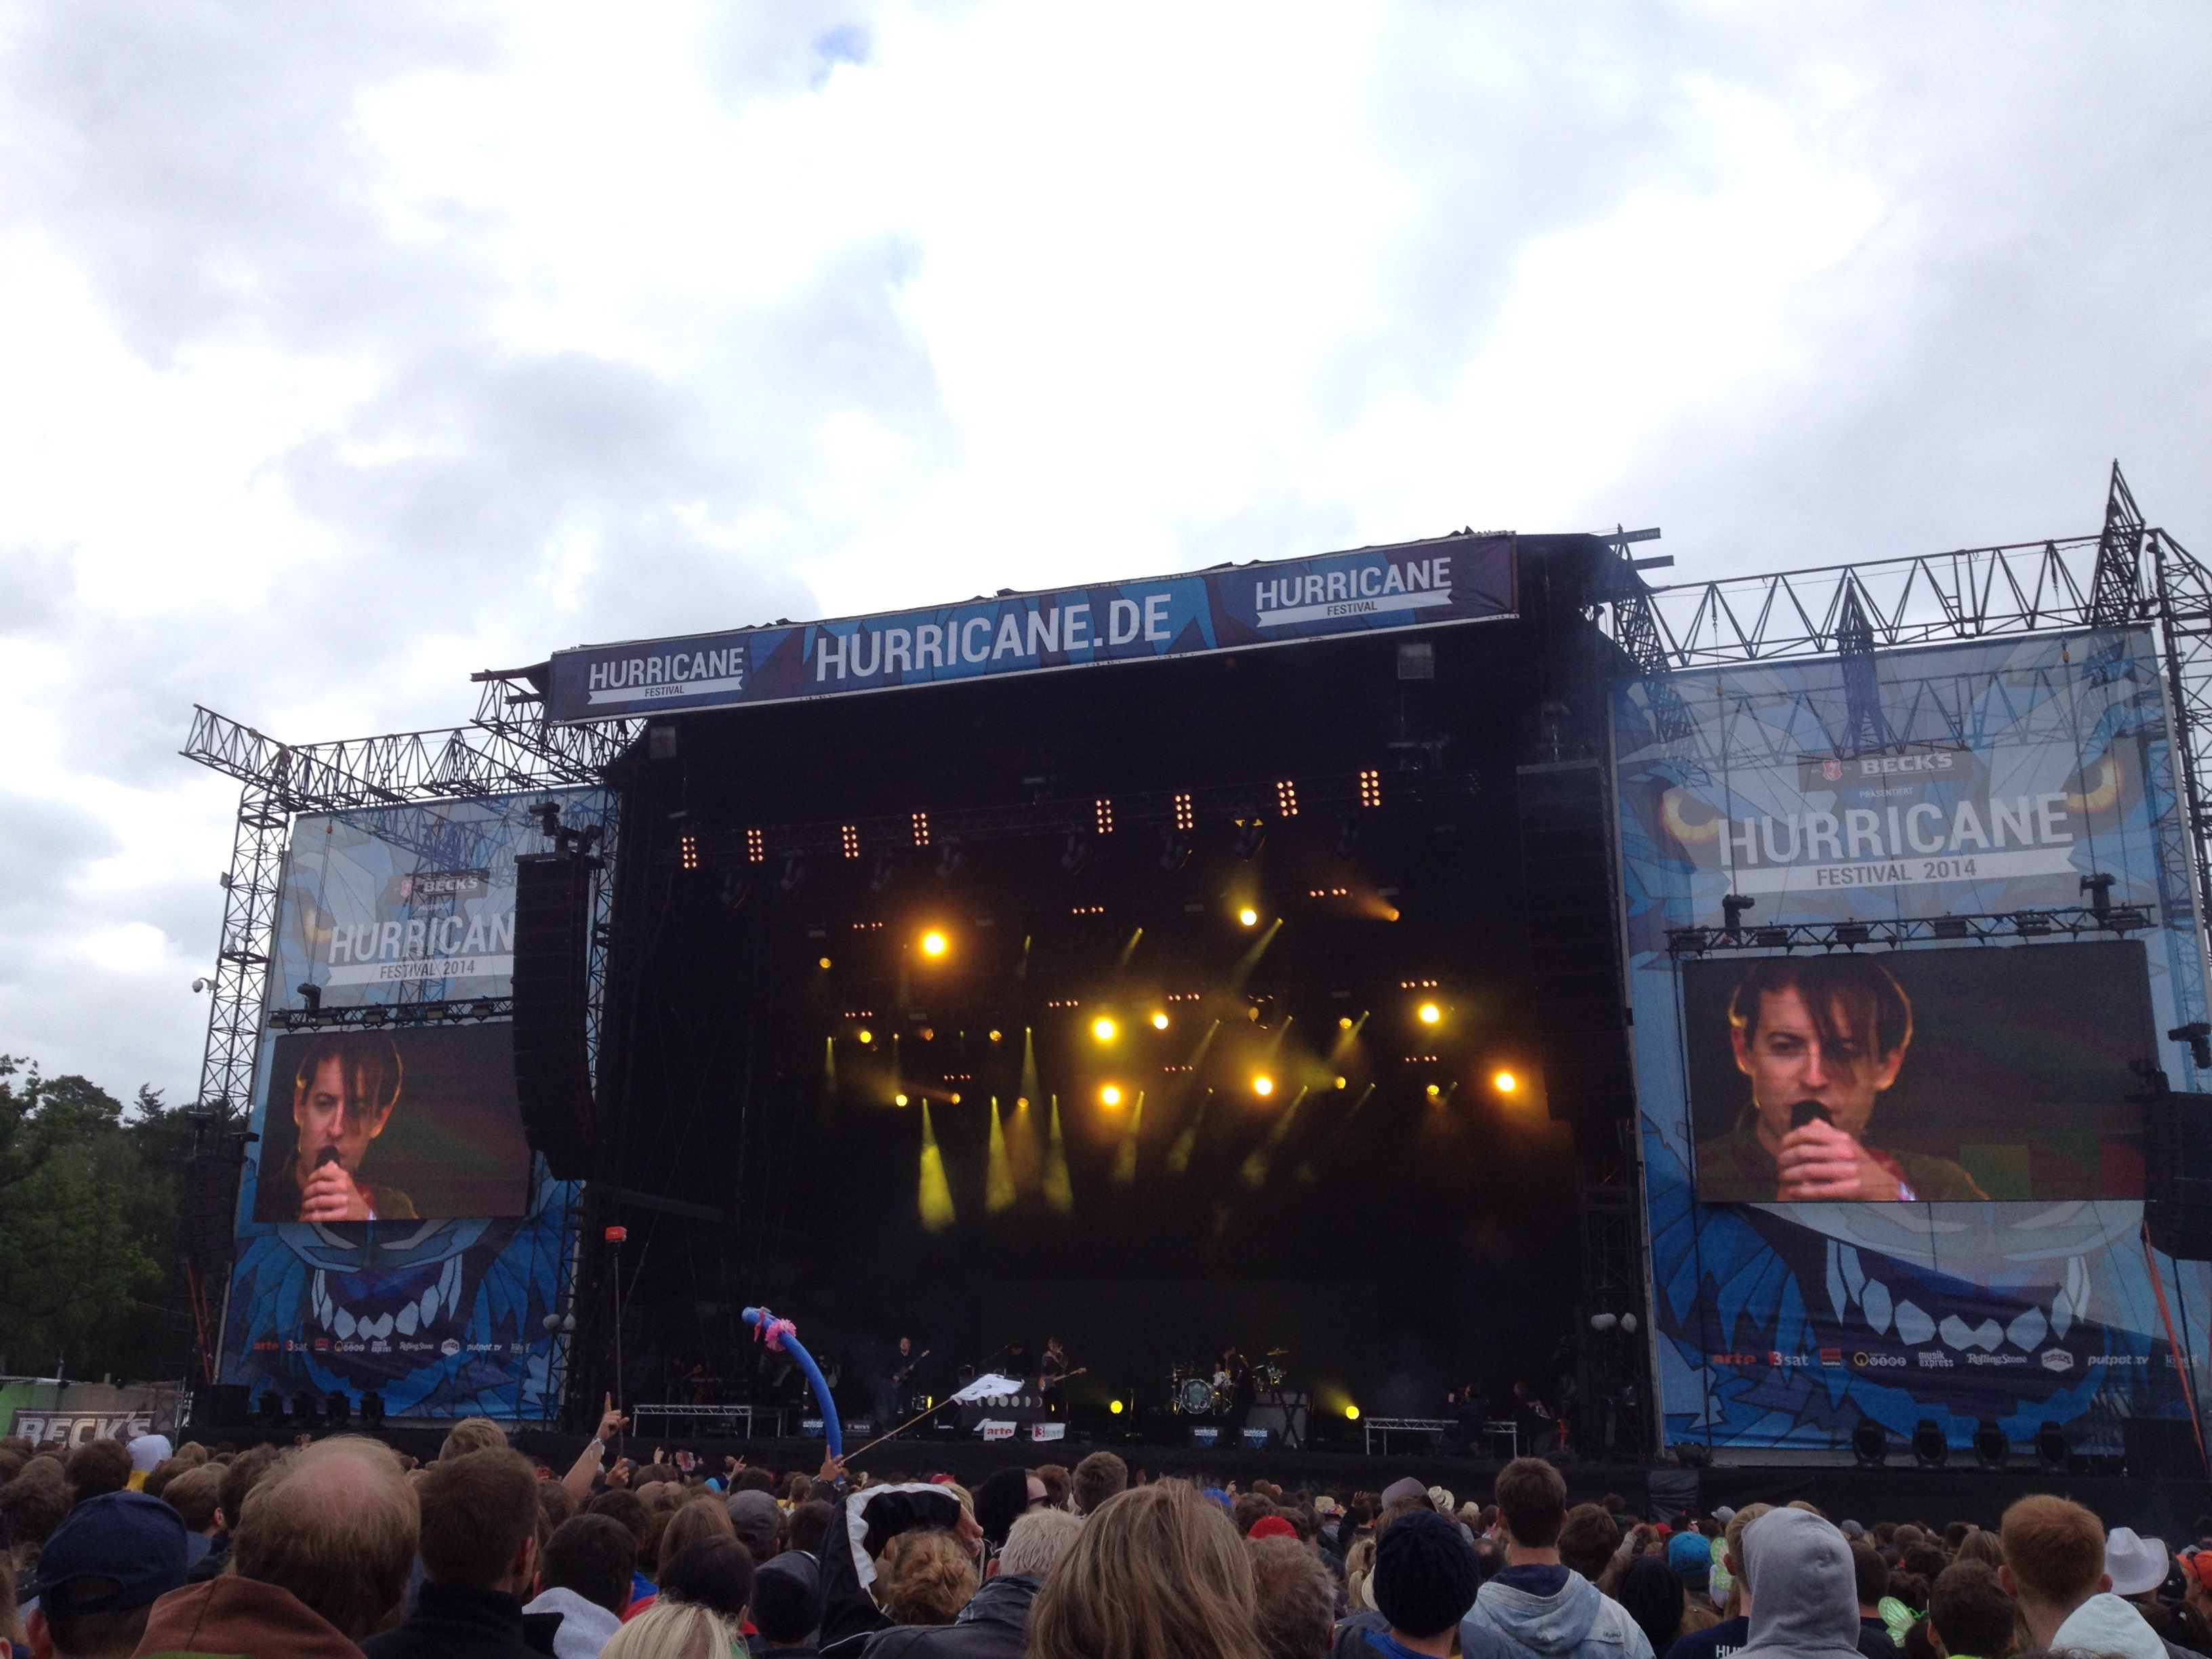 Hurricane Festival in Scheeßel